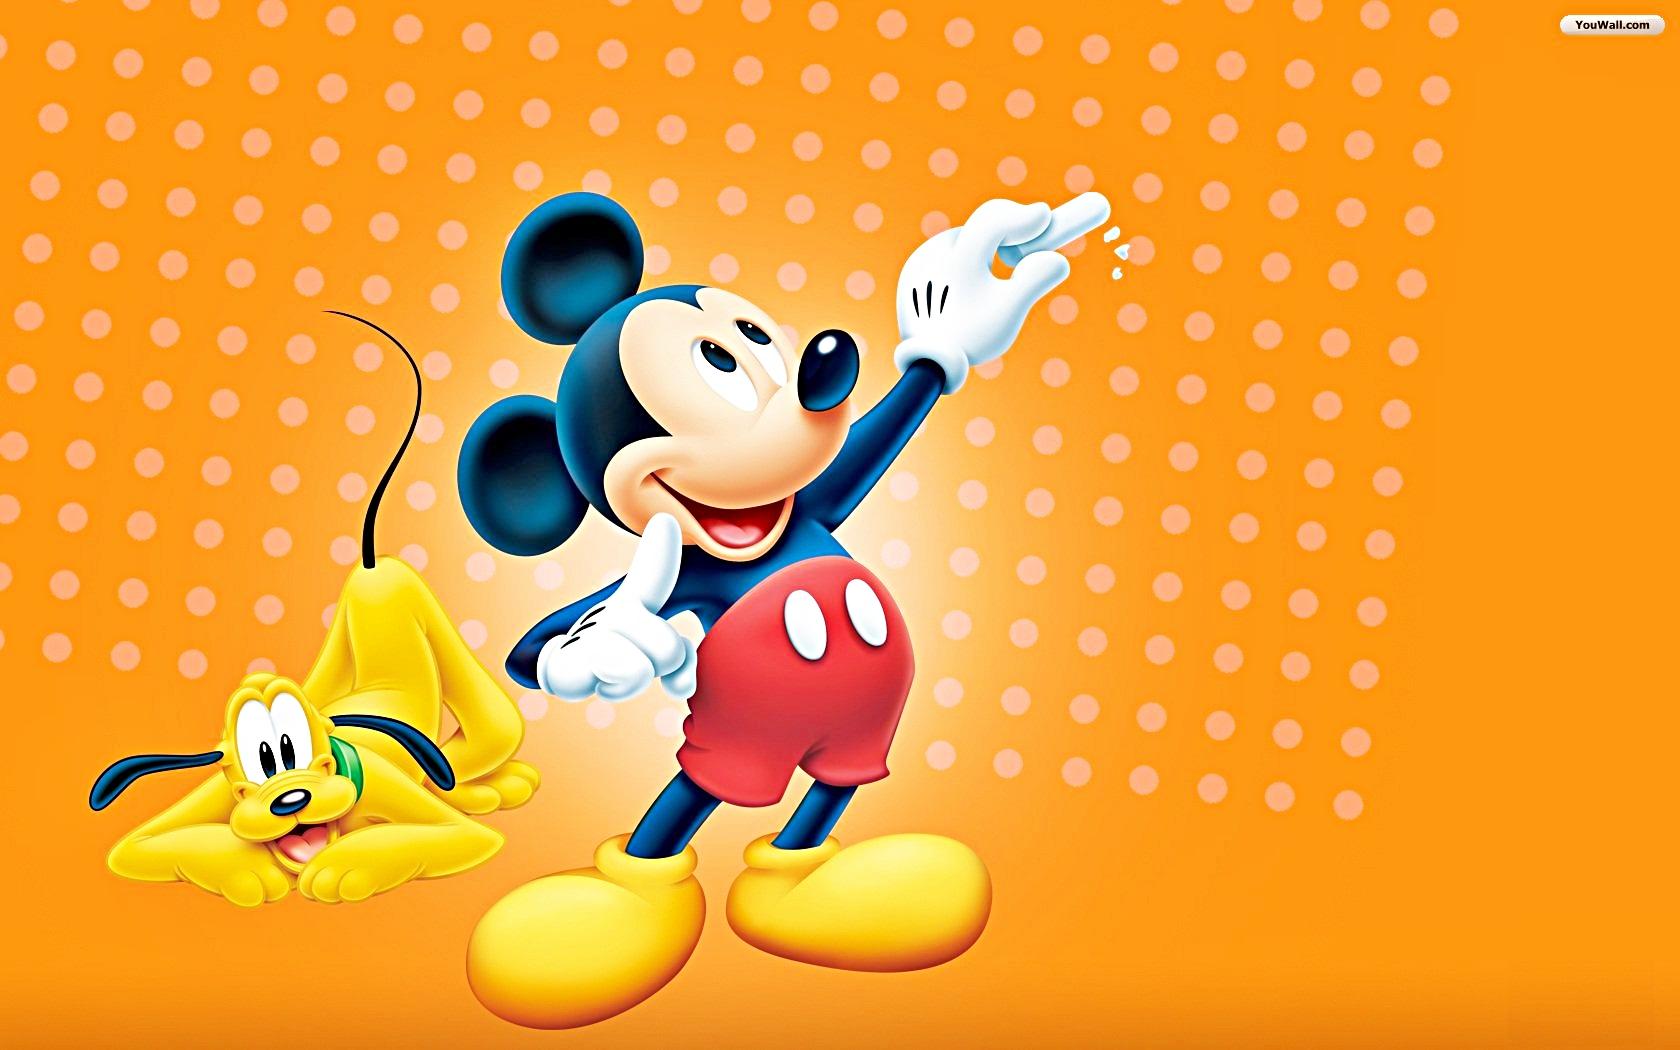 Mickey Mouse Walt Disney Wallpaper Windows